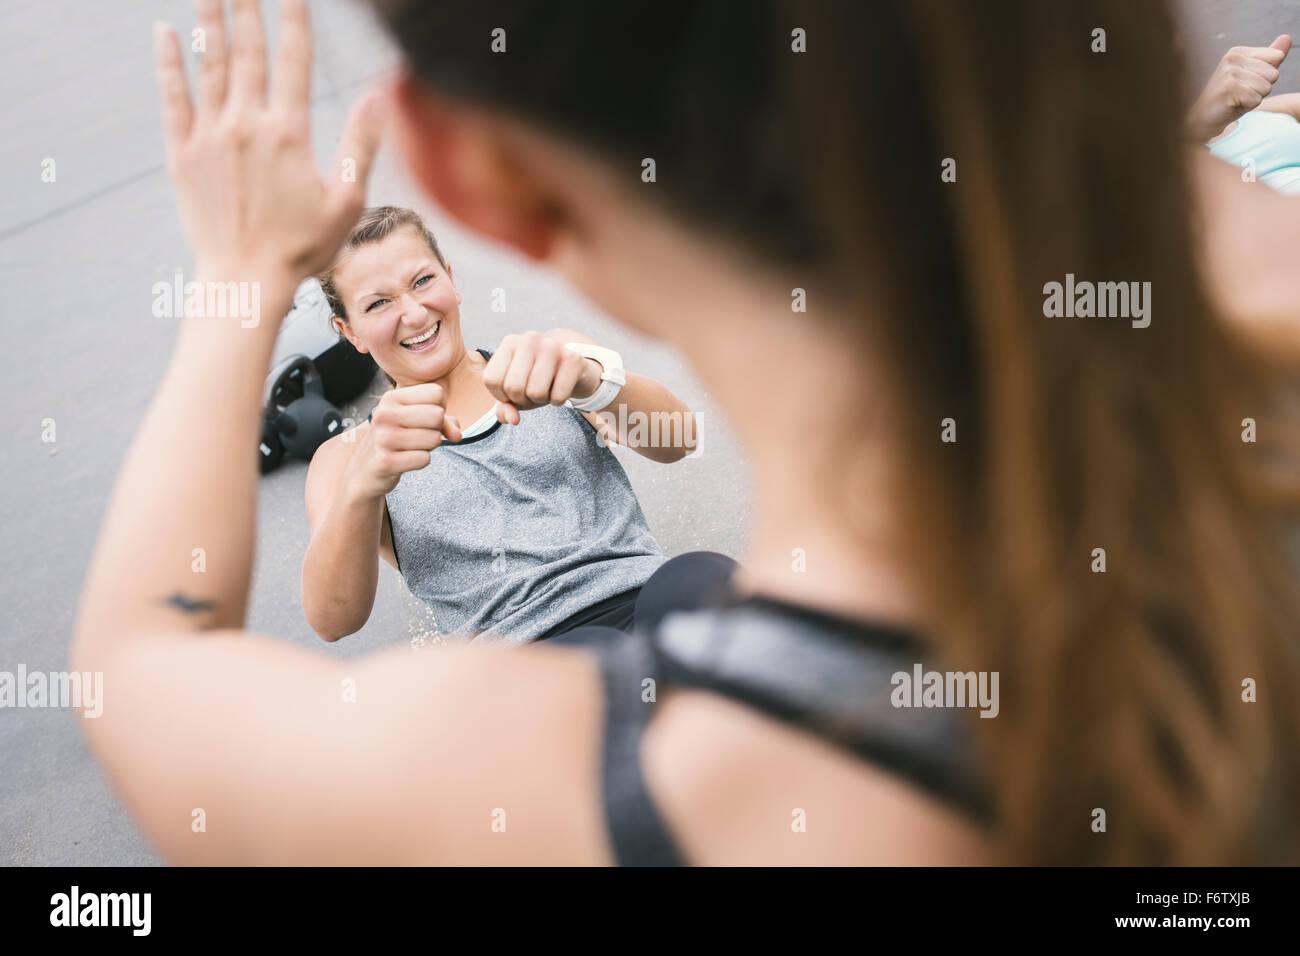 Women having an outdoor boot camp workout Stock Photo